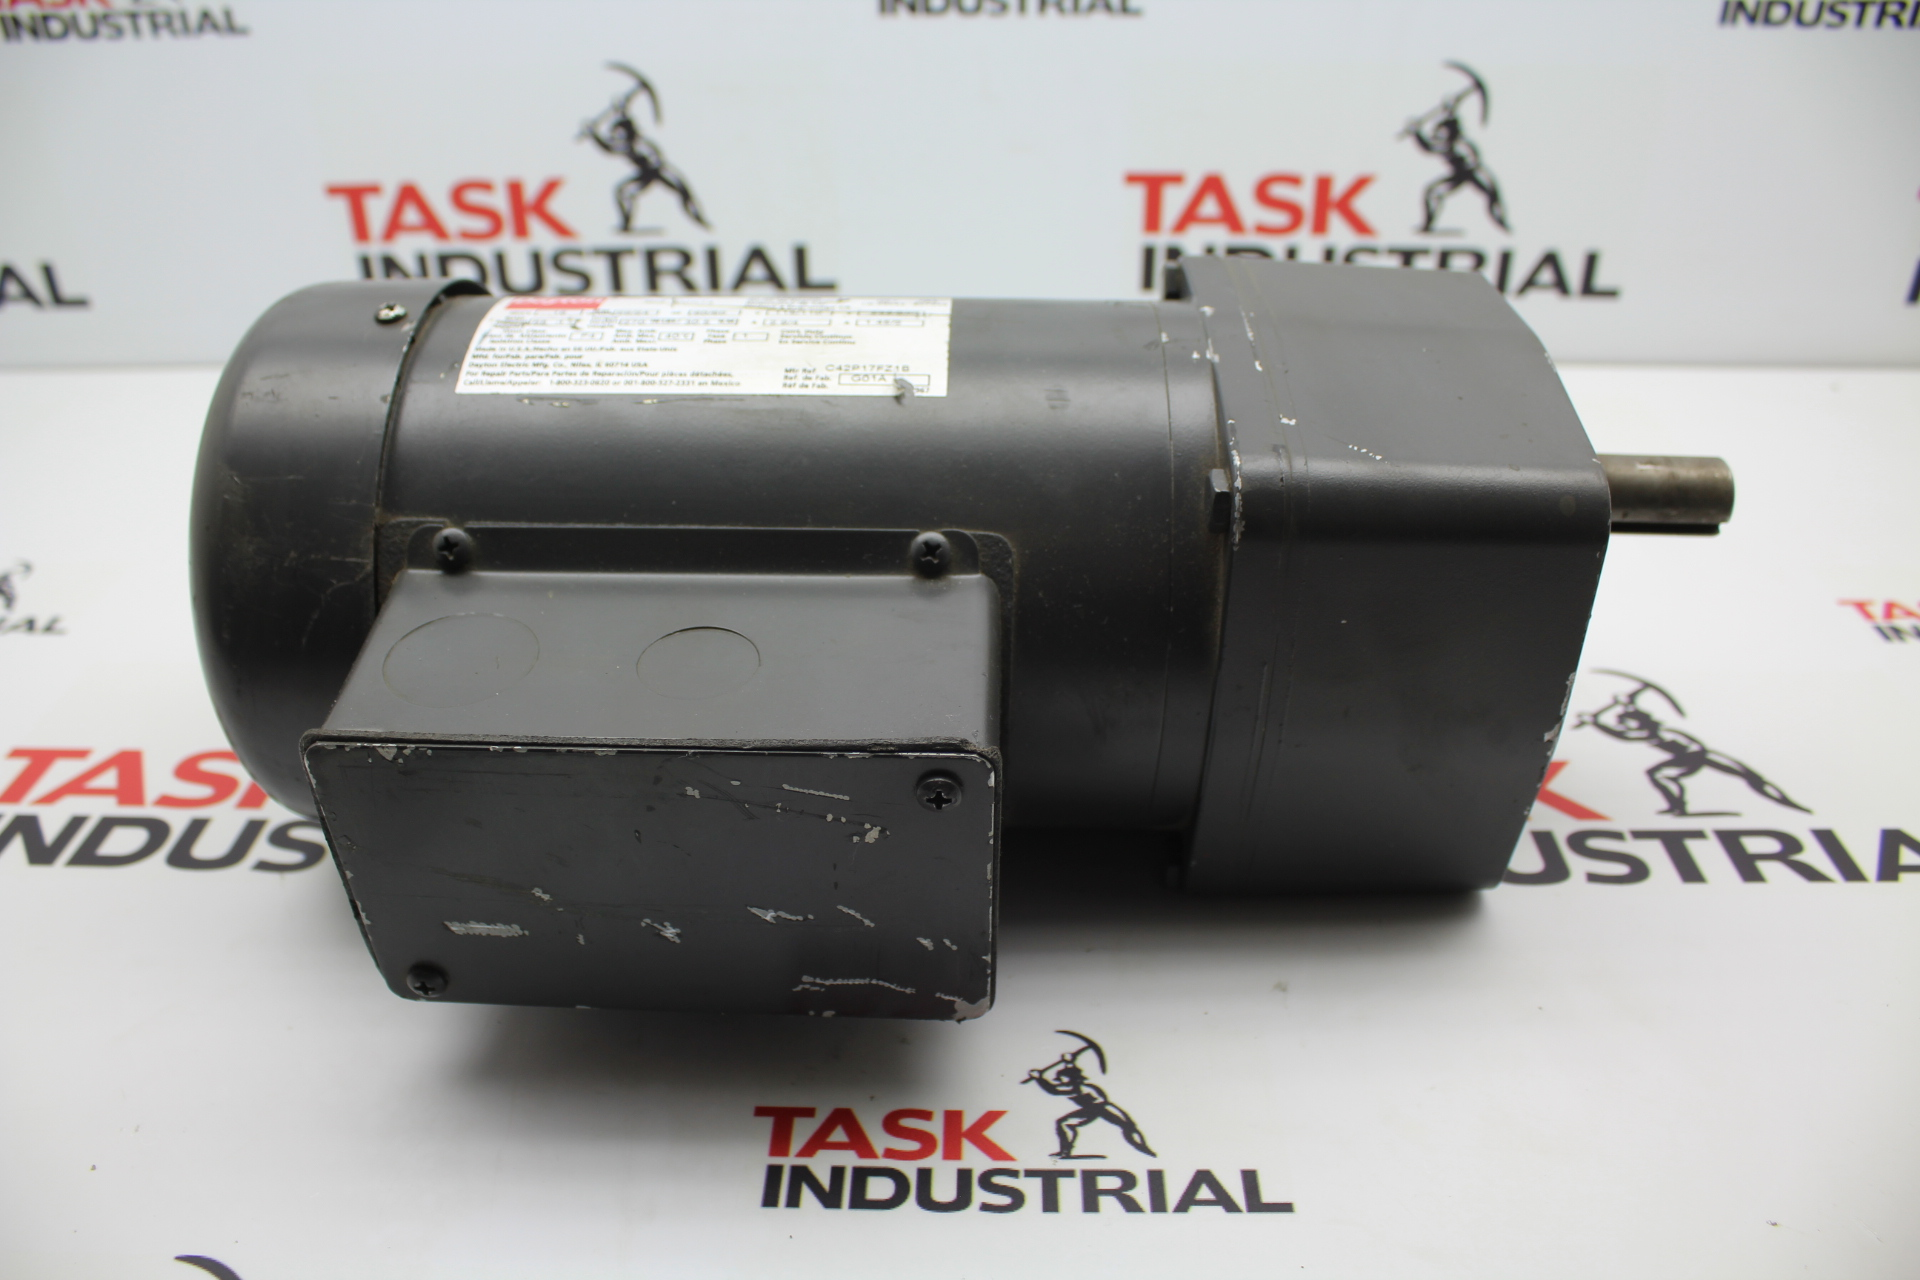 Dayton AC Gearmotor .16 HP, 29/24 RPM, 115/110 VOLT, 1 PH, 6MK74